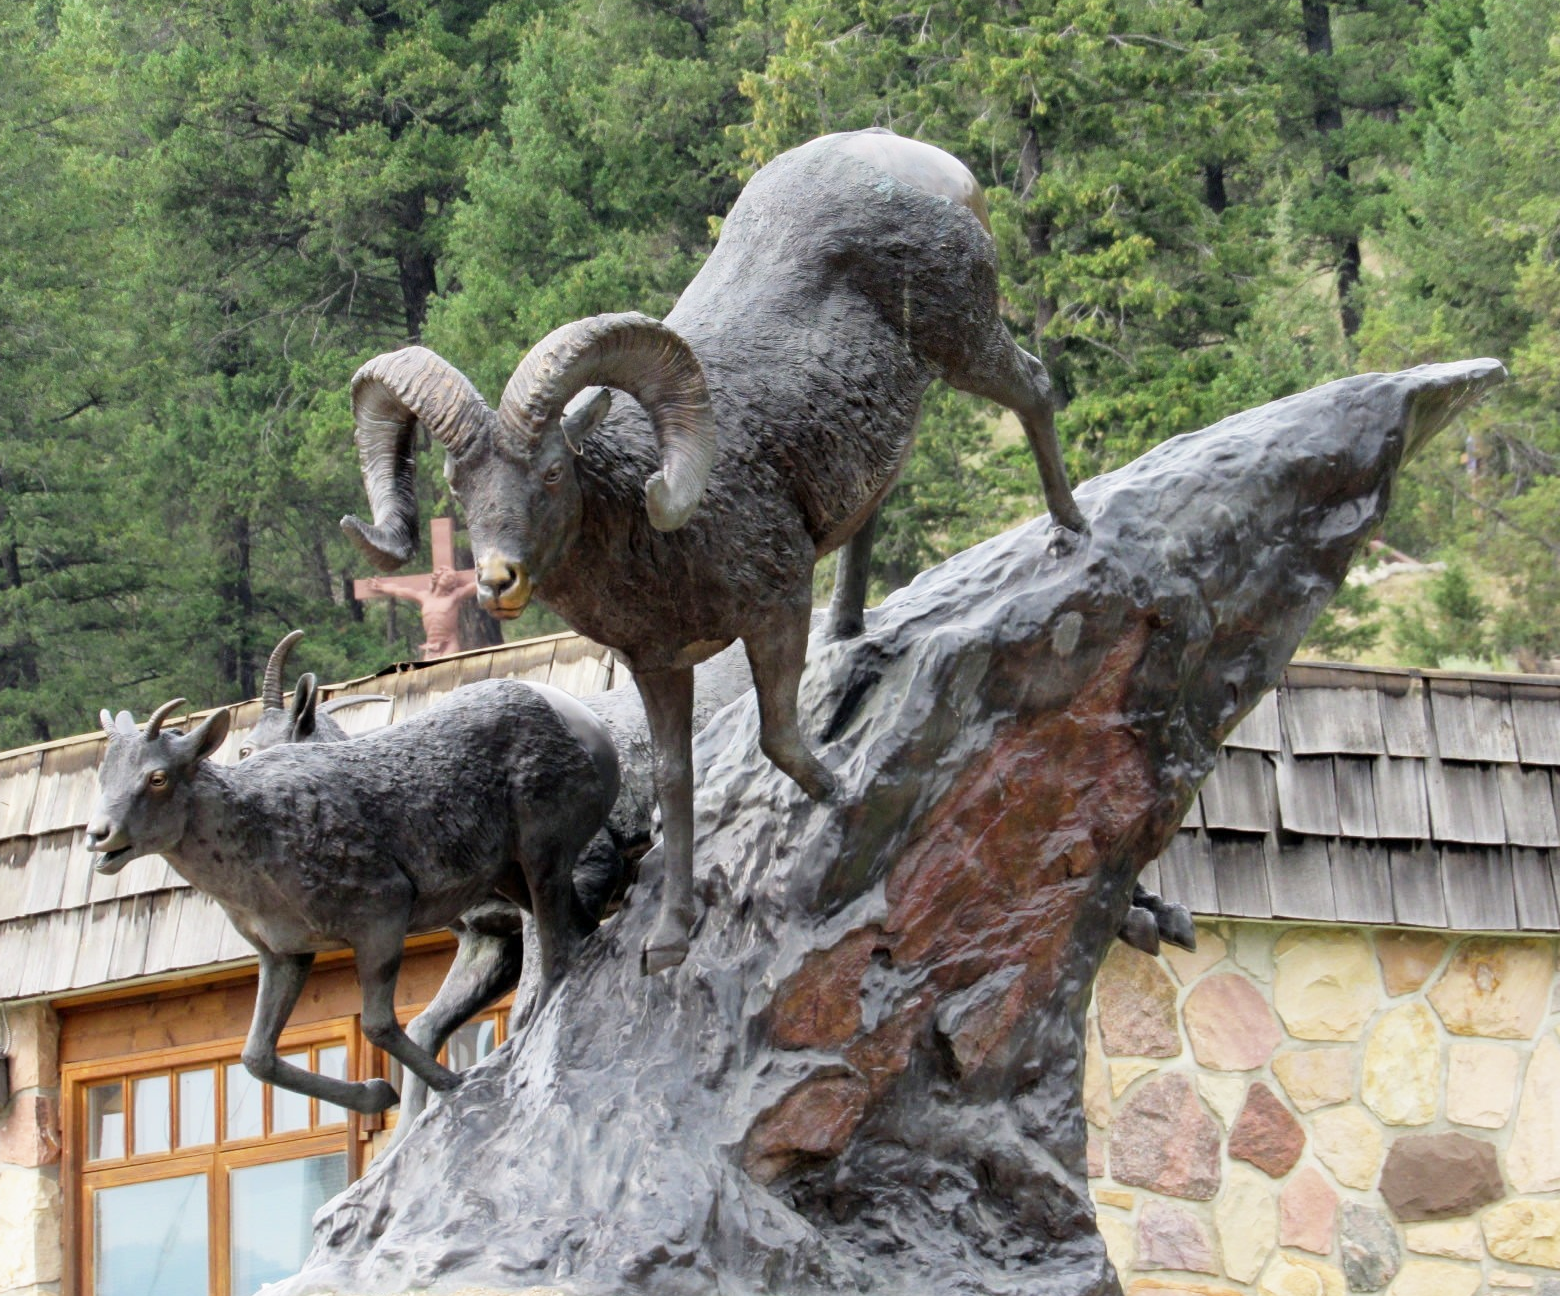 Bronze Animal standing on stone bighorn sheep sculpture